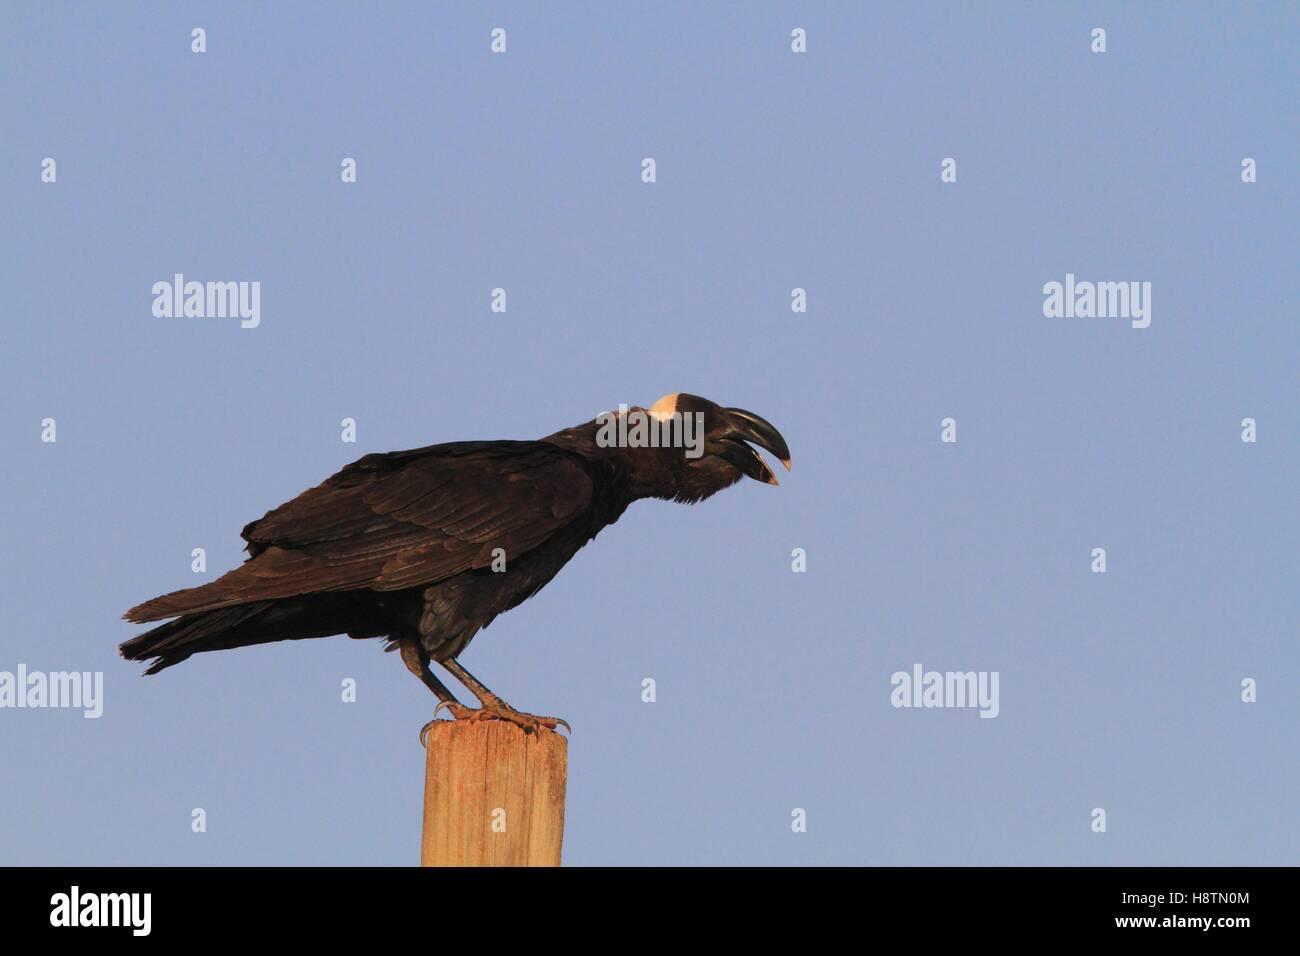 Thick-billed Raven (Corvus crassirostris). Ethiopia - Stock Image